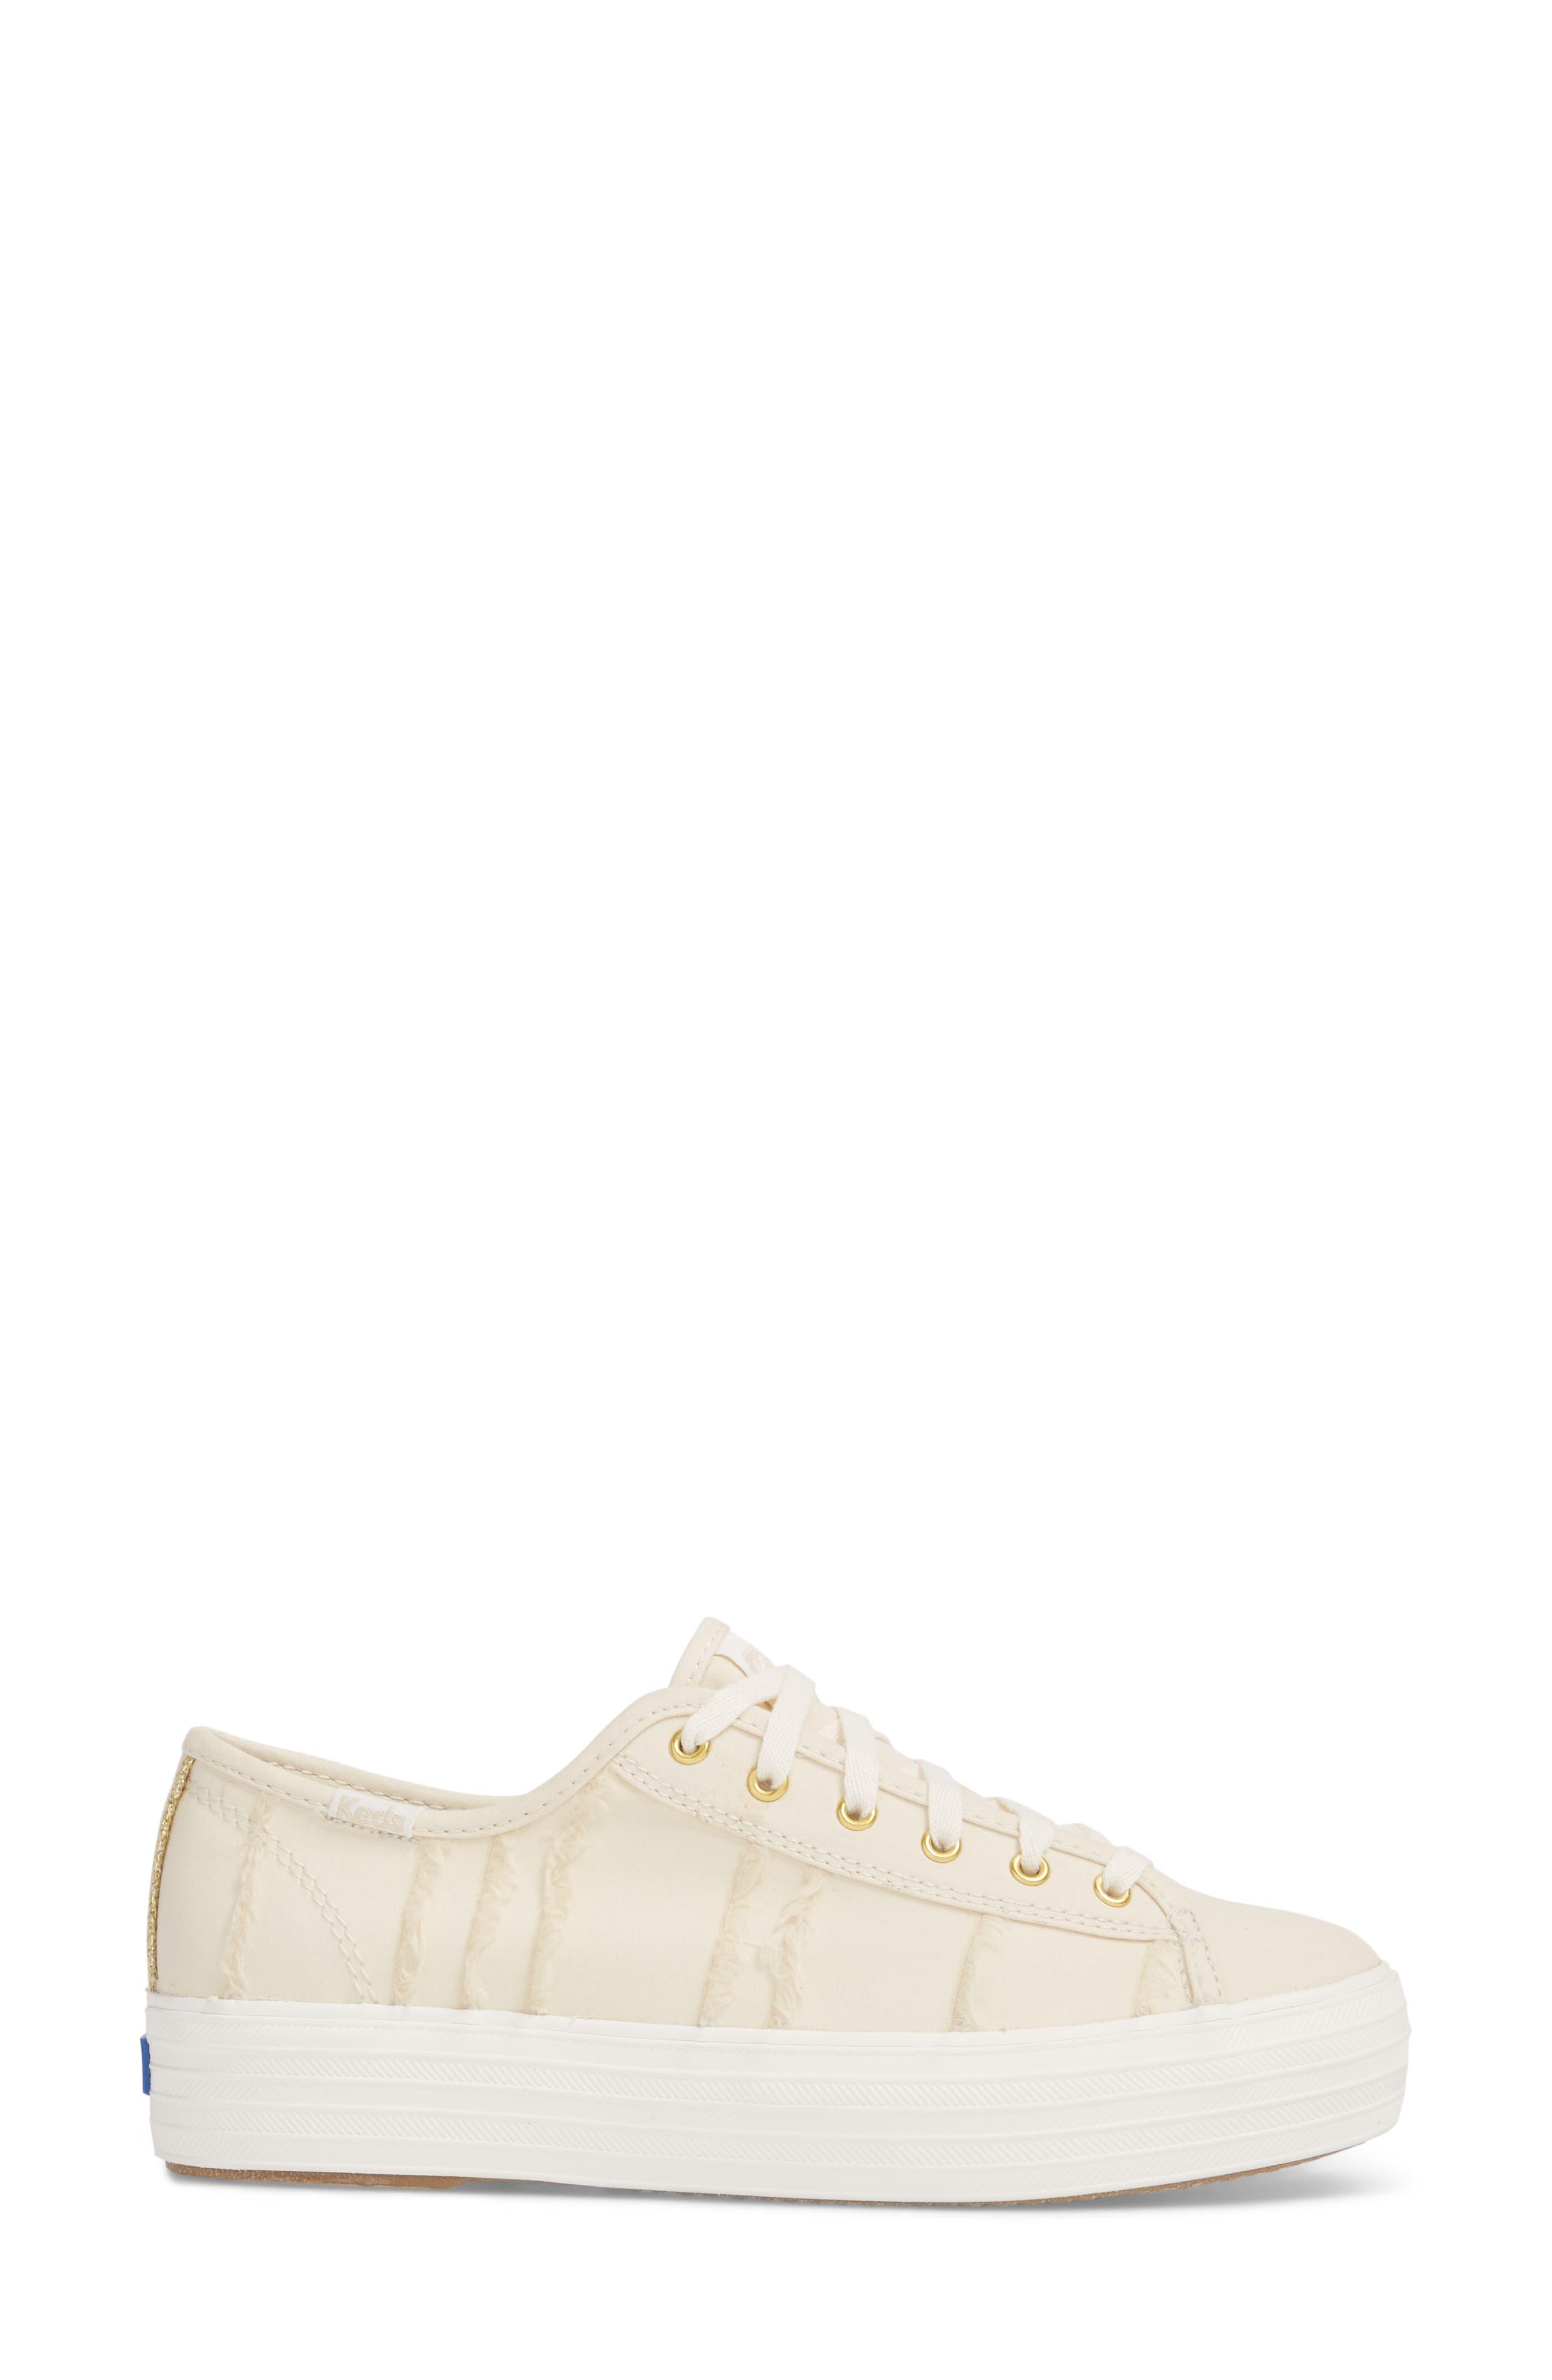 Triple Kick Canvas Sneaker,                             Alternate thumbnail 3, color,                             Cream